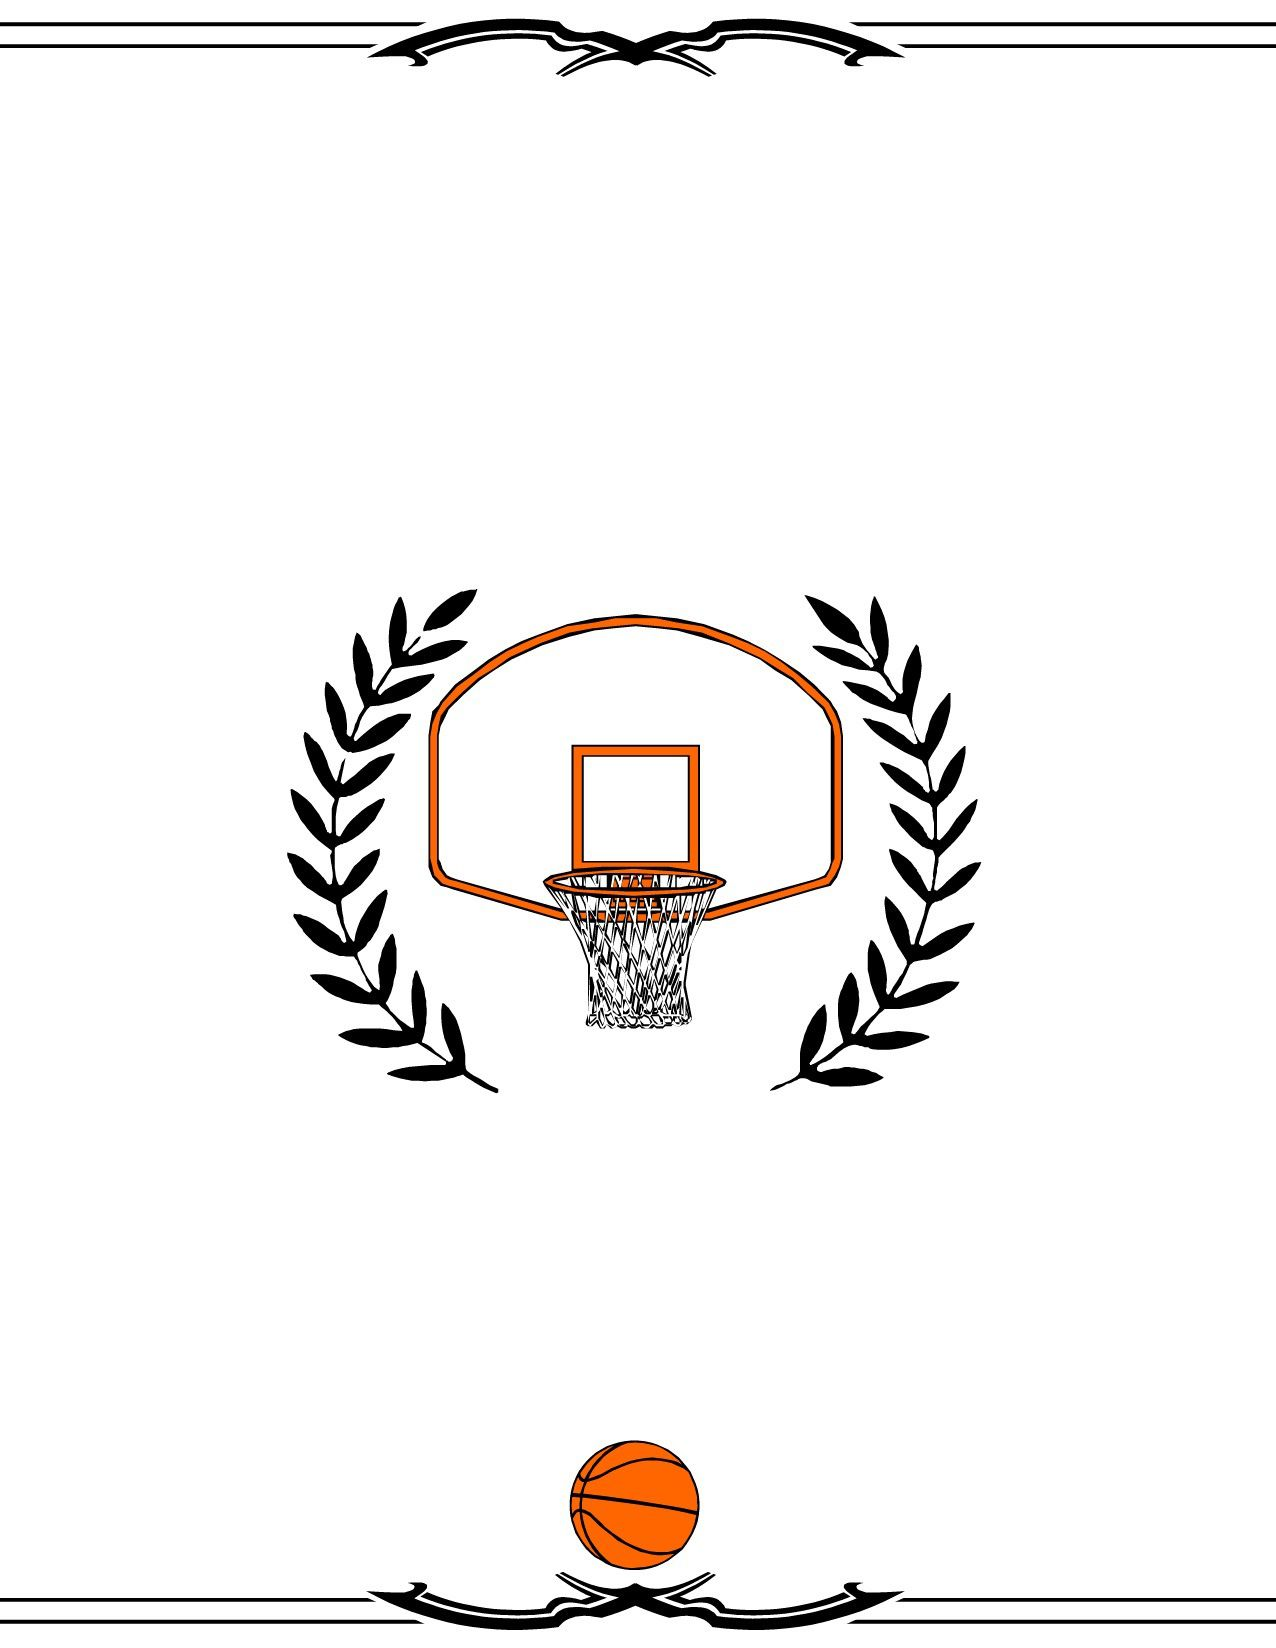 004 Astounding Free Printable Basketball Certificate Template Image  TemplatesFull